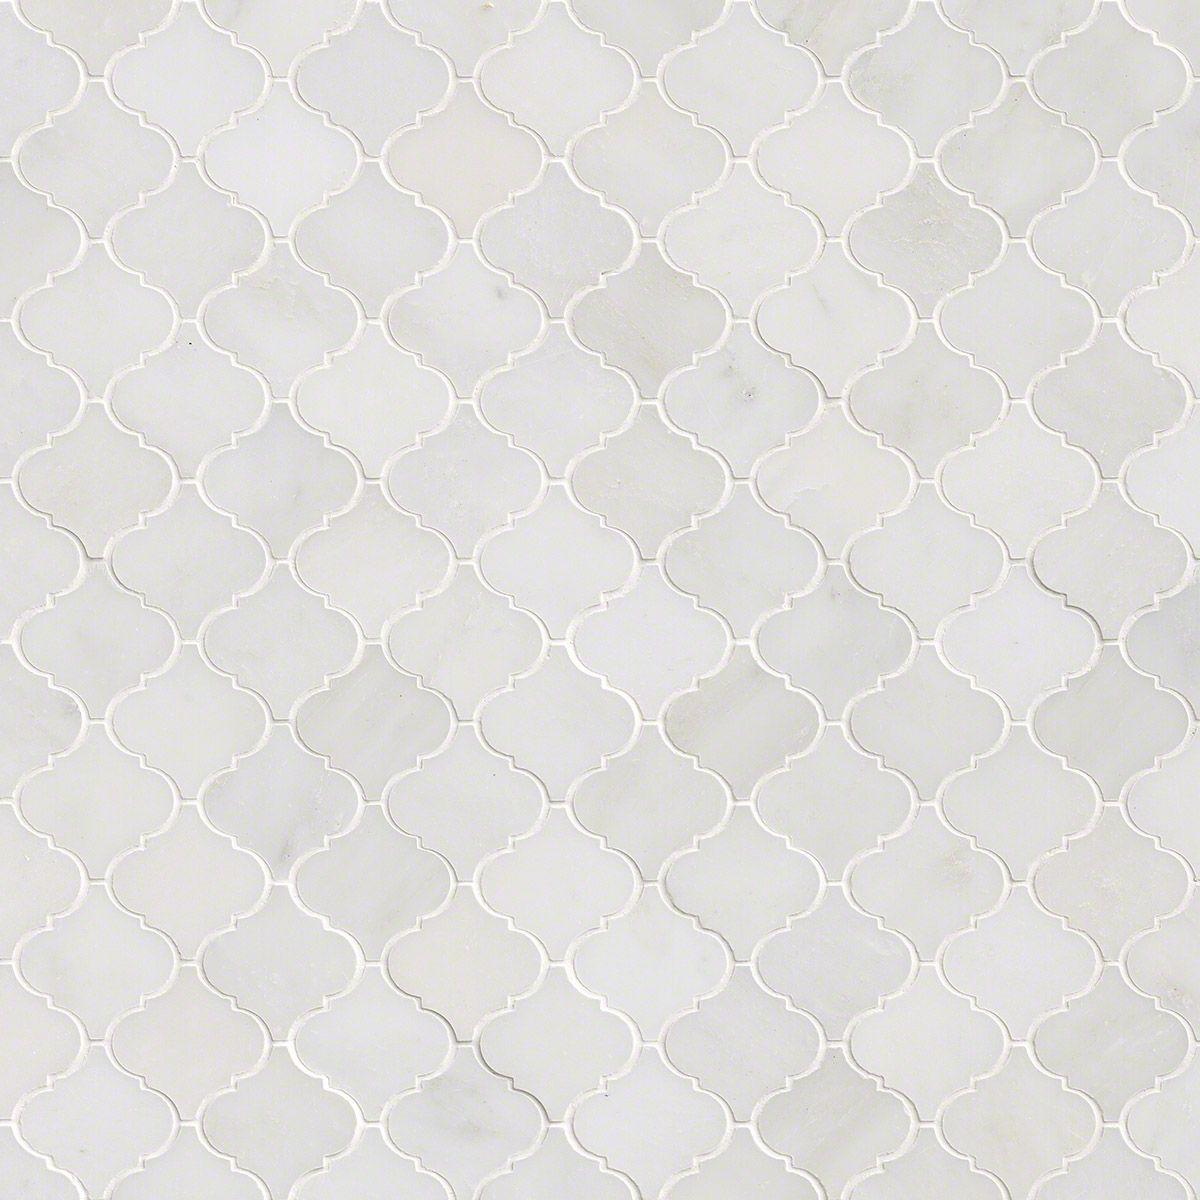 Greecian White Arabesque Pattern Polished Marble Backsplash Tile Marble Tile Backsplash Backsplash Arabesque Marble Backsplash